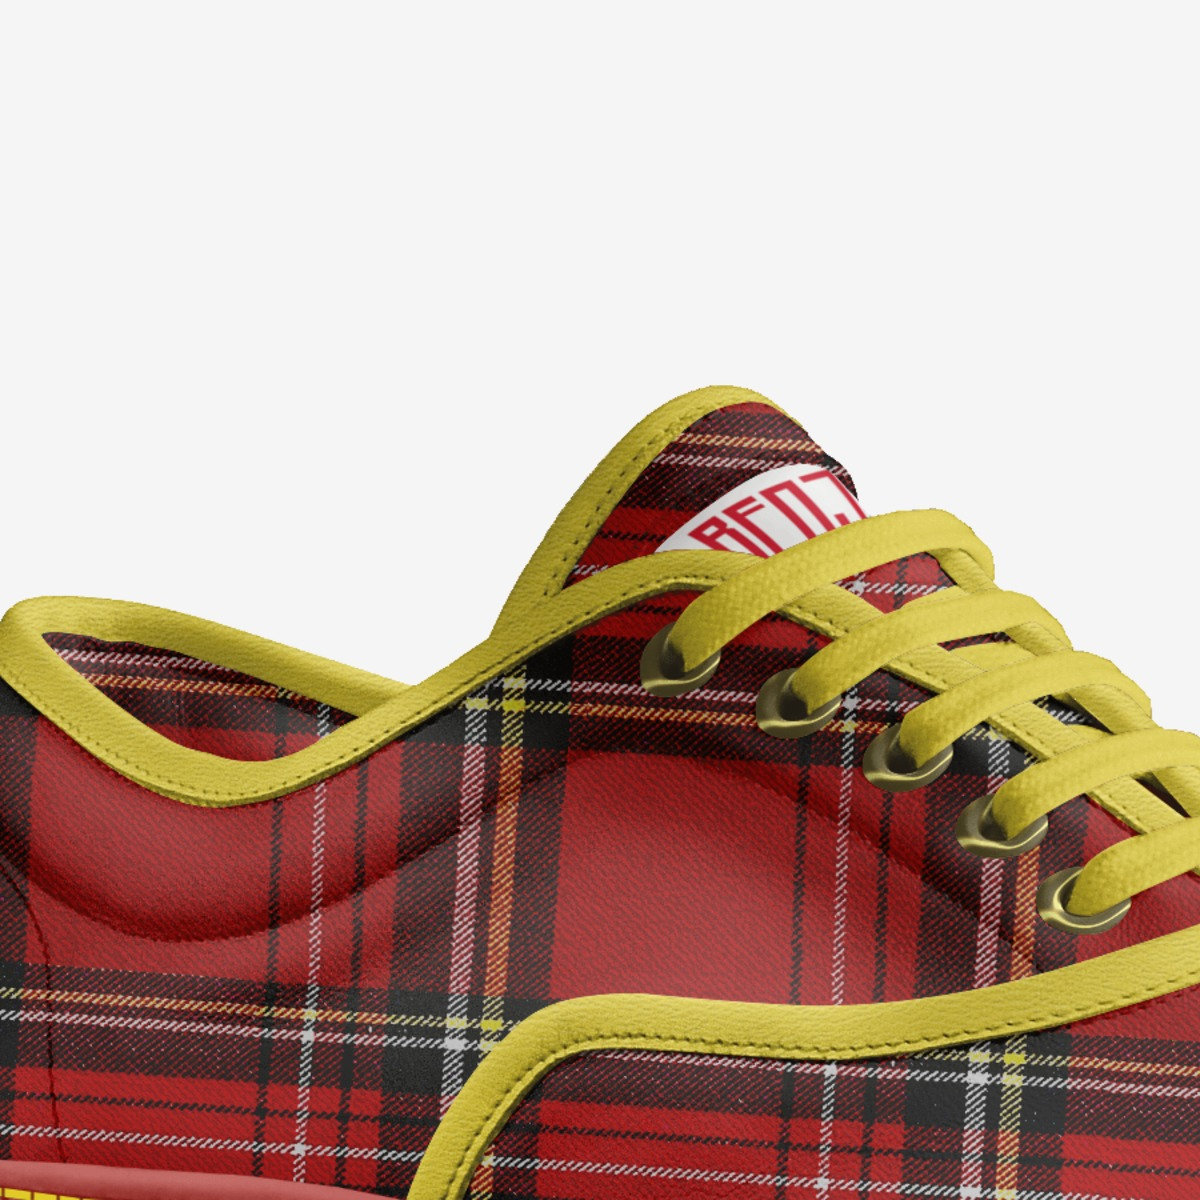 benj-shoes-detail (3).jpg